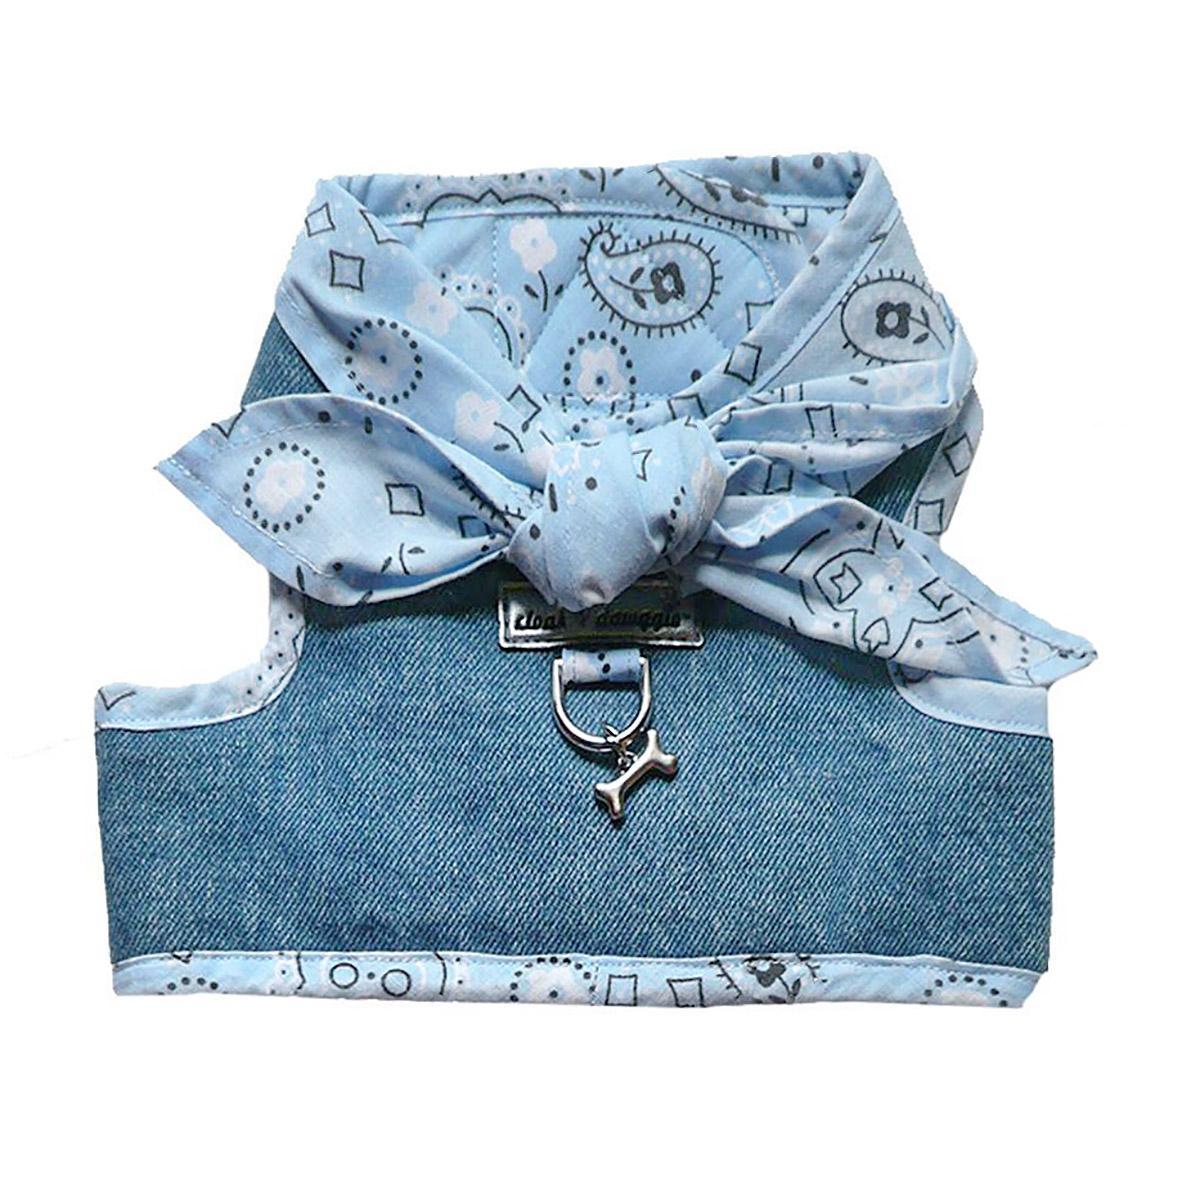 Denim Scarf Tie Dog Harness Vest - Blue Bandana